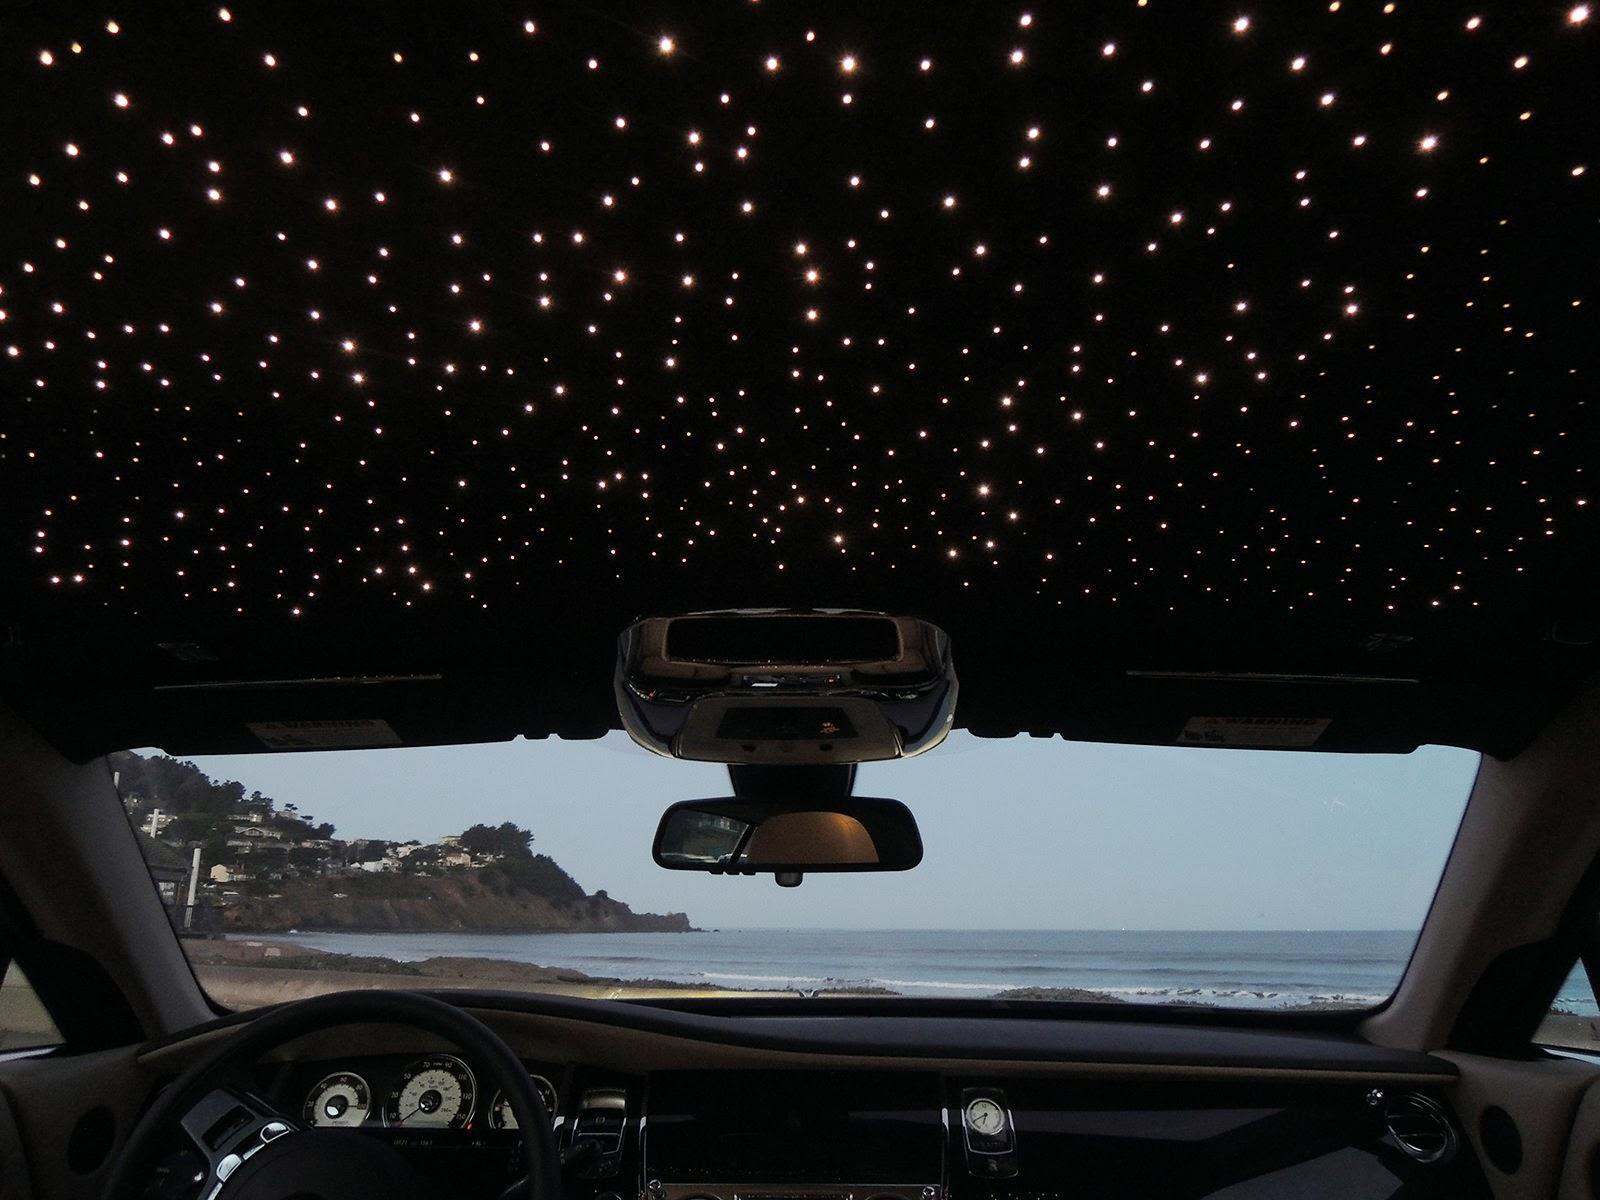 автомобиль звездное небо картинки редко